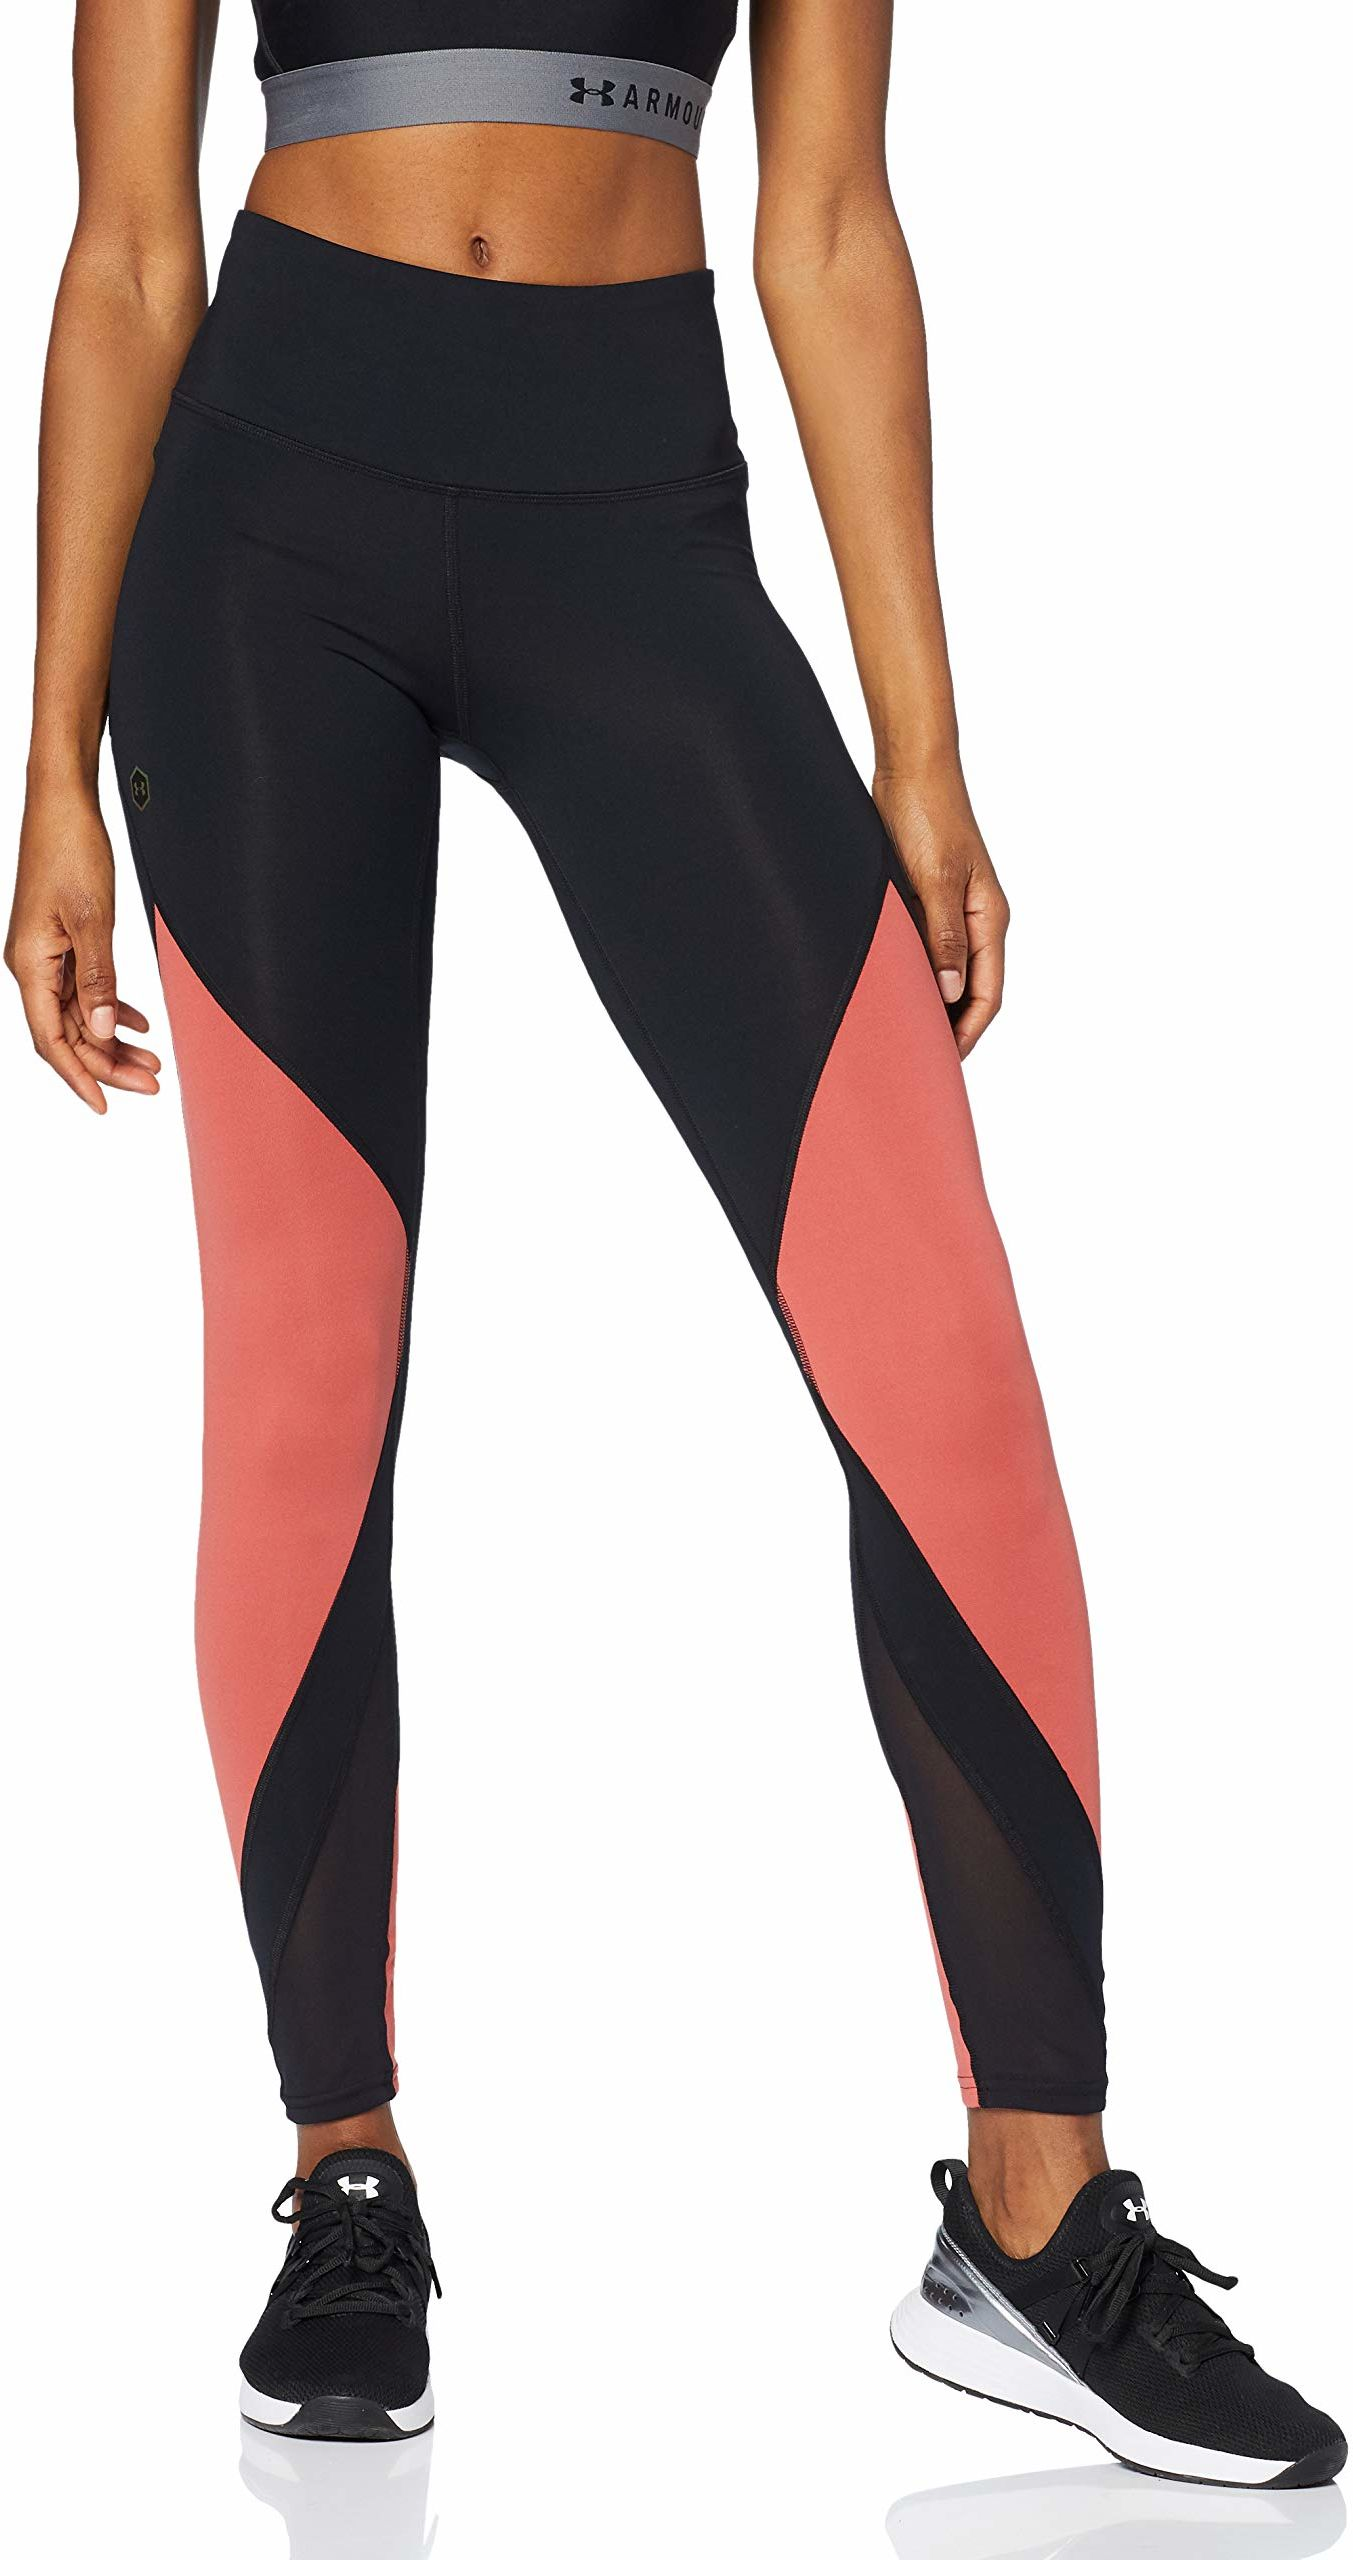 Under Armour damskie legginsy szczytu Black/Fractal Pink/Black (003) XS